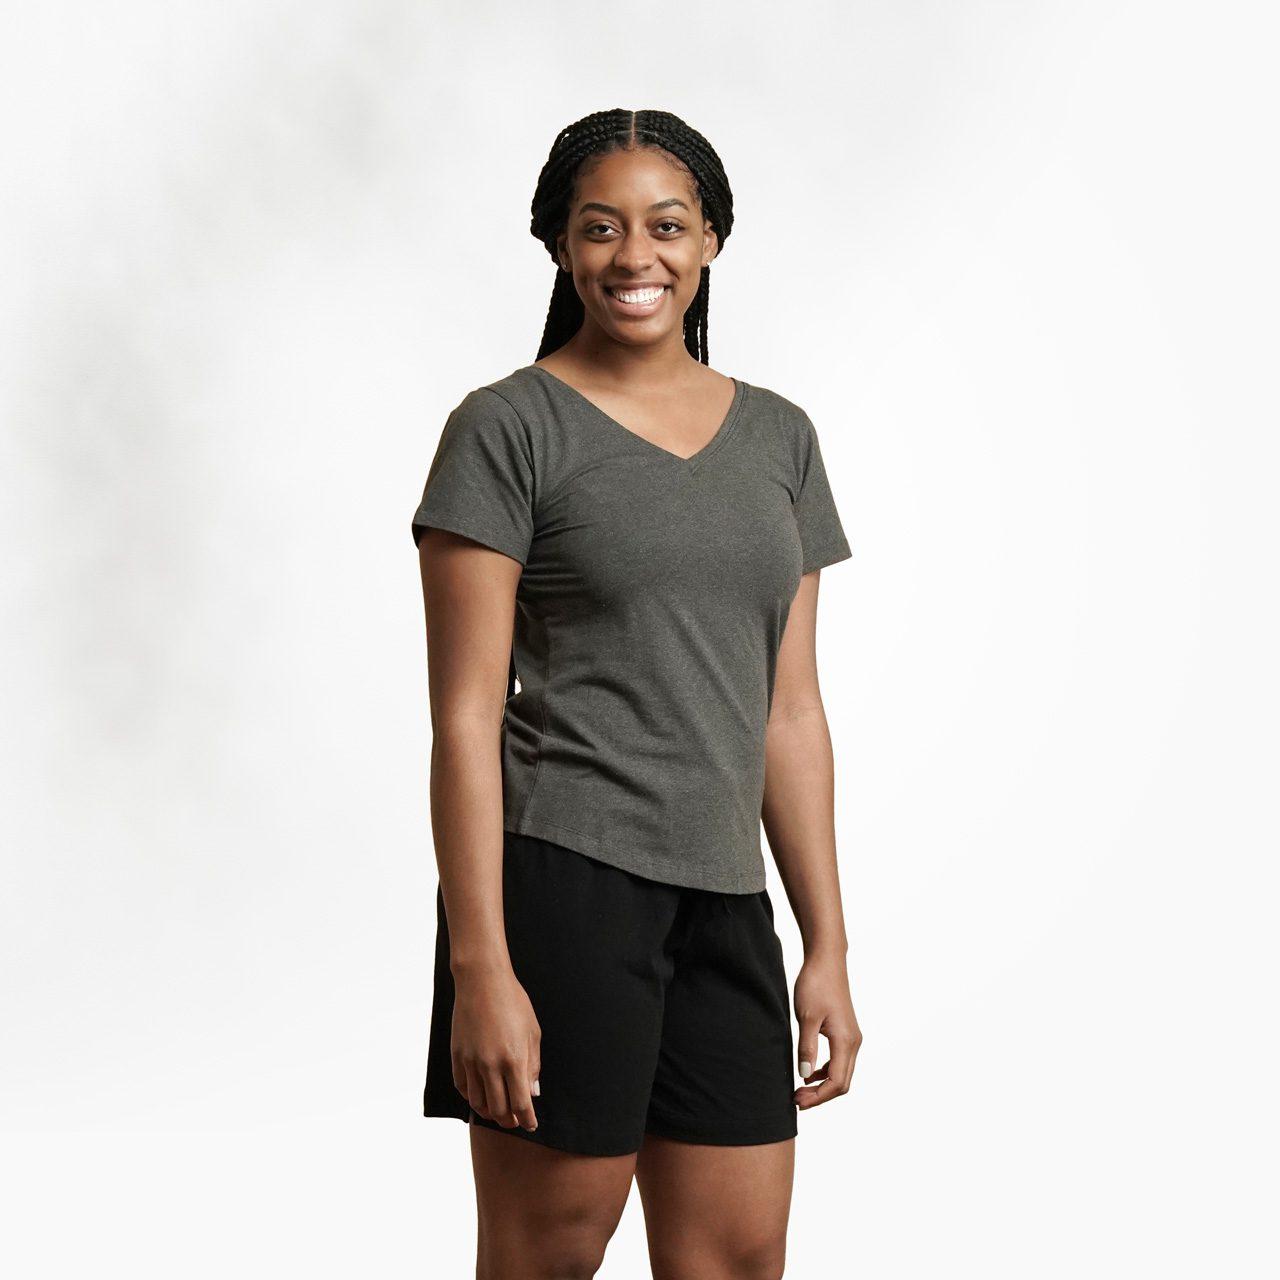 Organic cotton womens t-shirt by Maggies Organics (charcoal grey) on Rosette Fair Trade